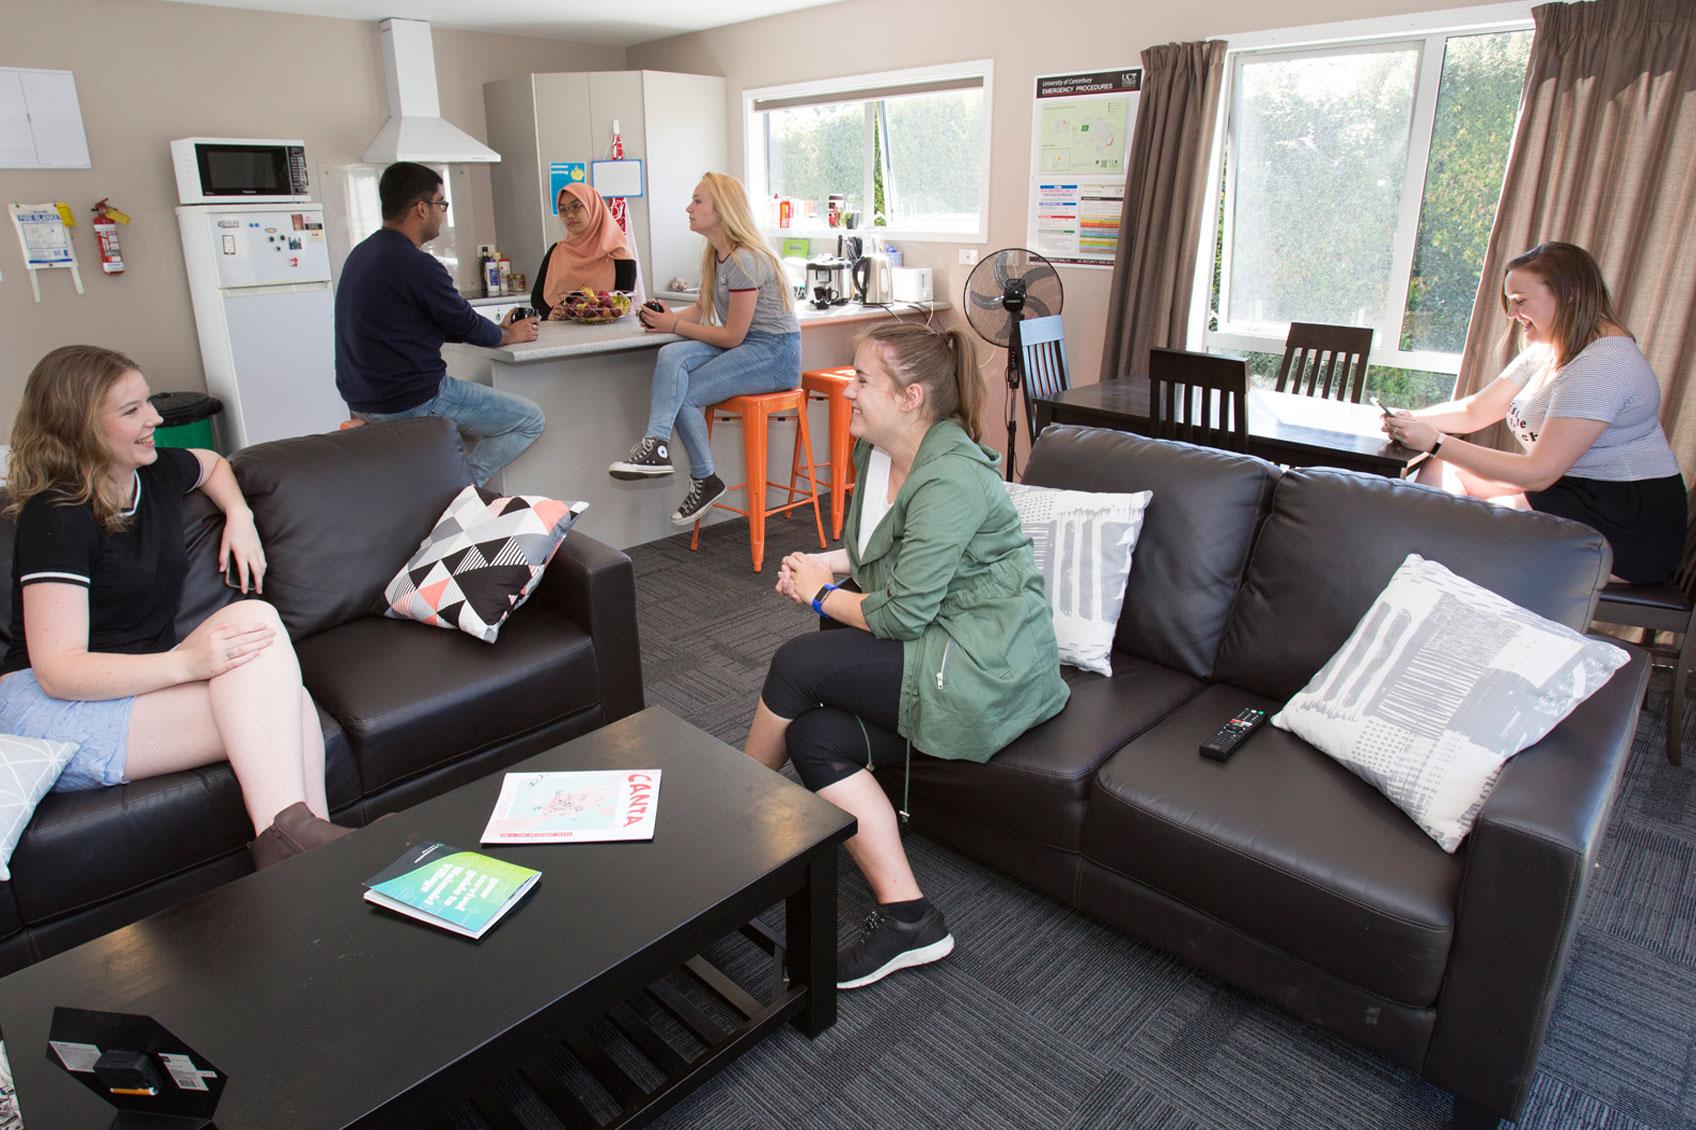 waimairi village students talking in lounge room